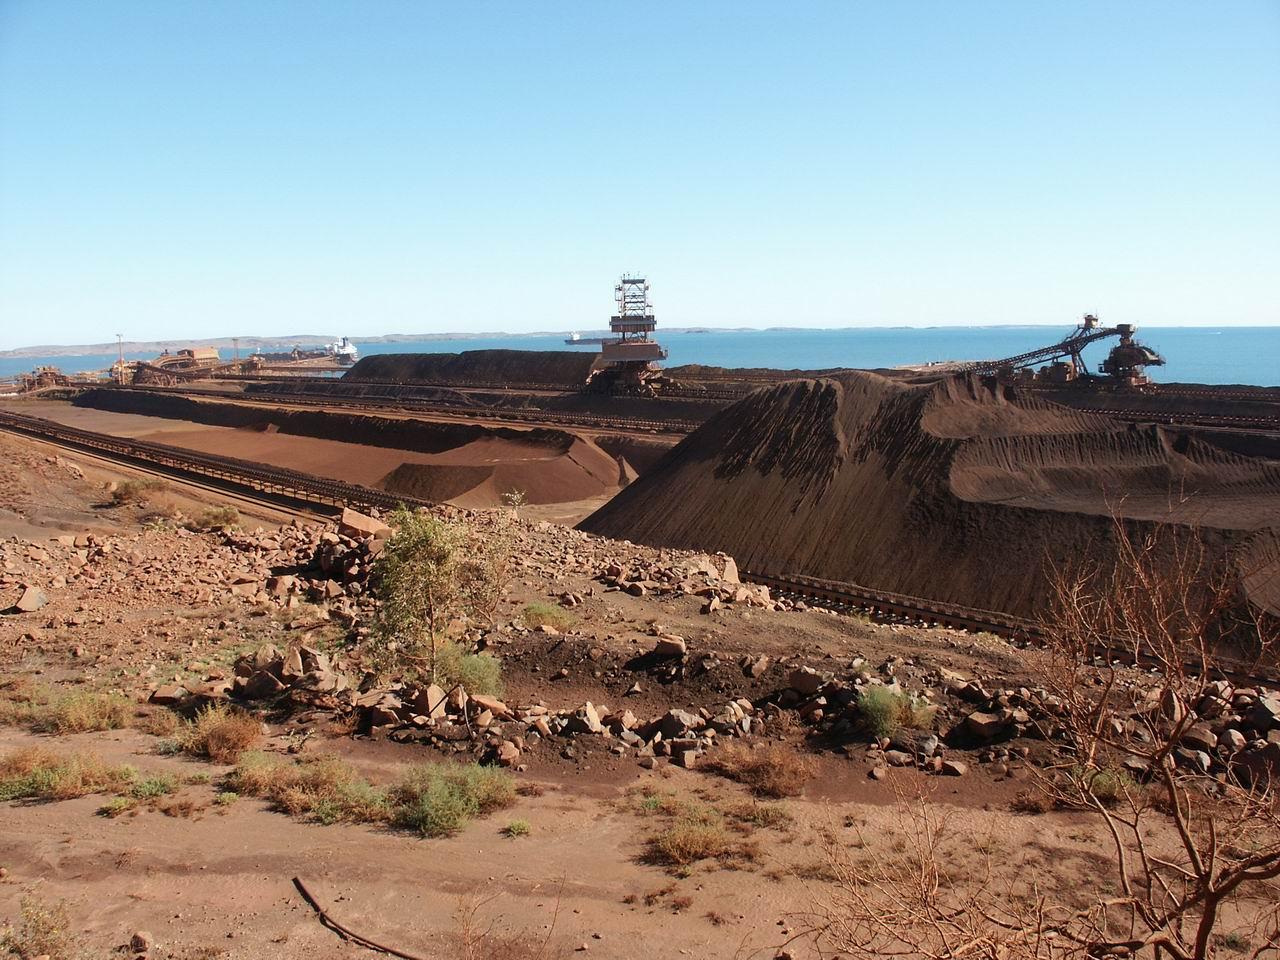 Http Nl M Wikipedia Org Wiki Bestand Dampier Iron Ore Western Australia Jpg